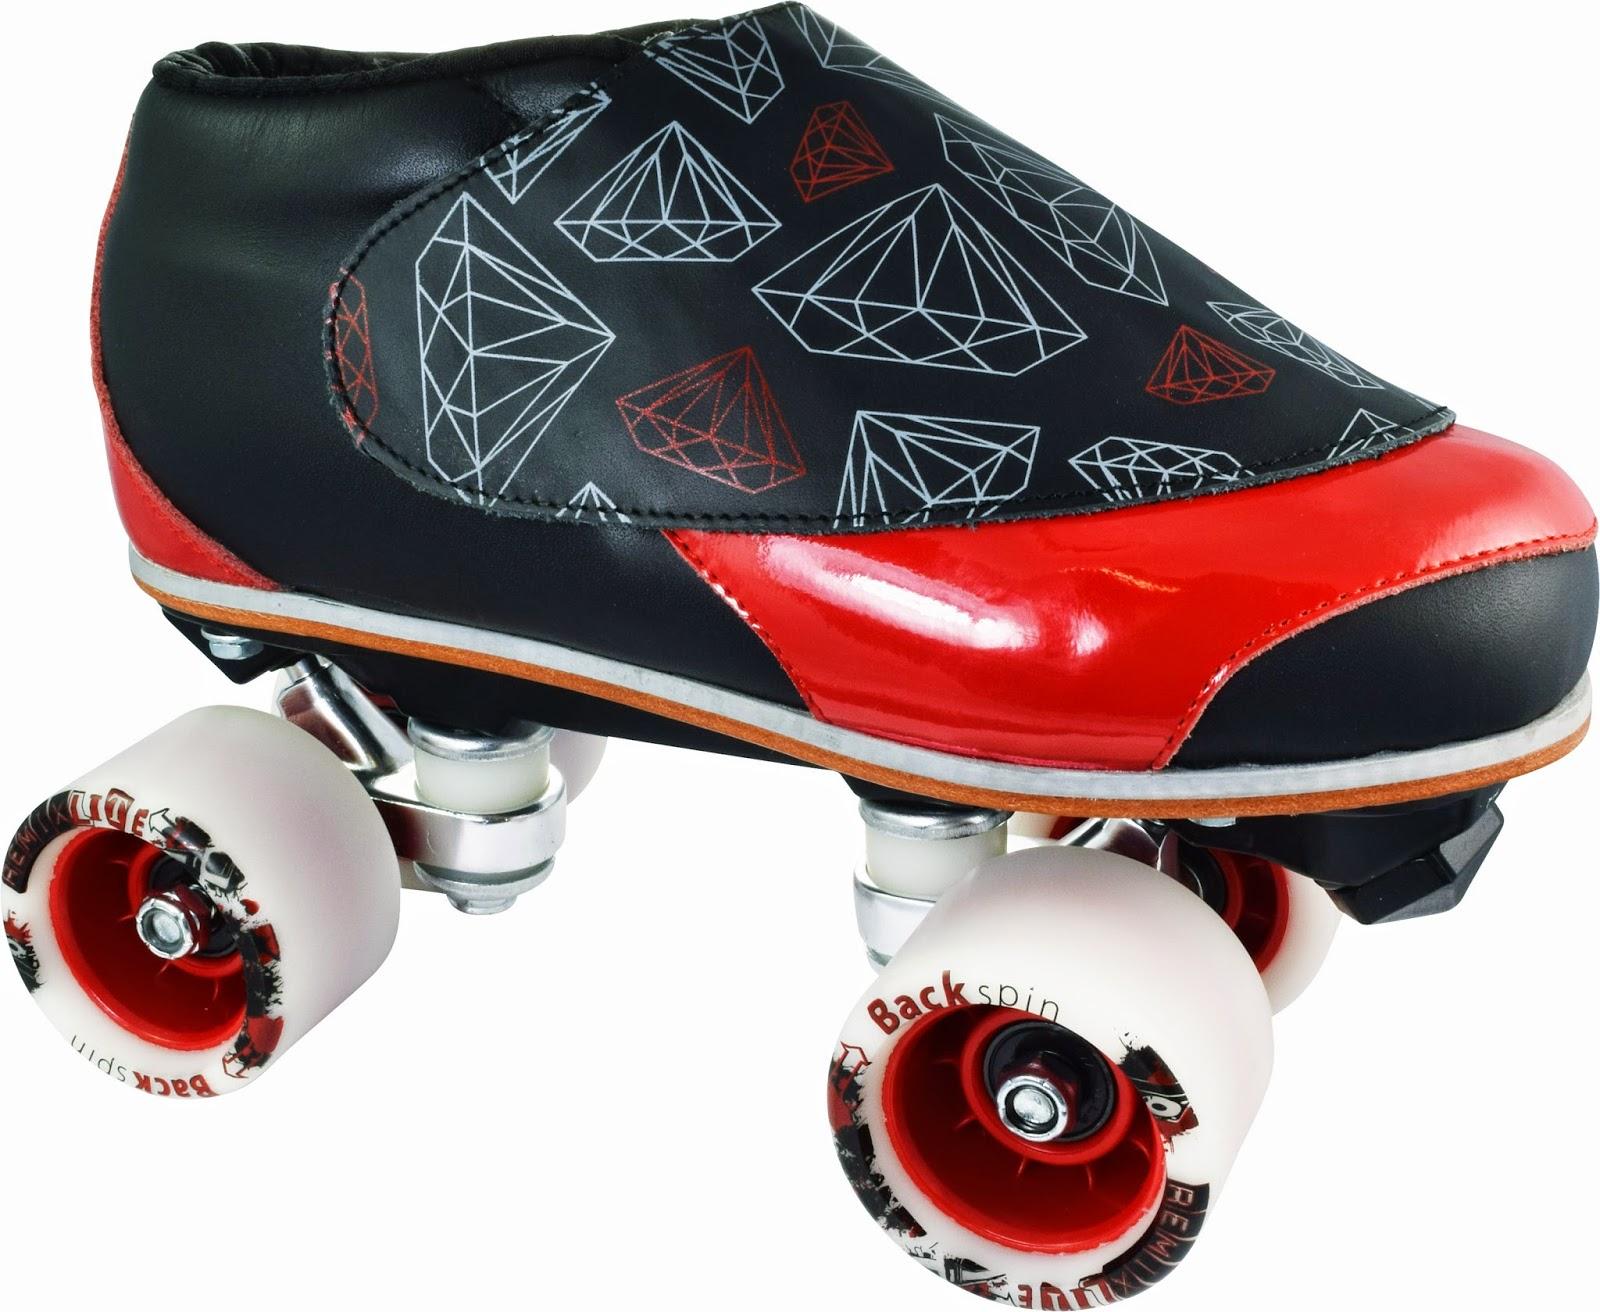 Roller skates for plus size - Friday October 3 2014